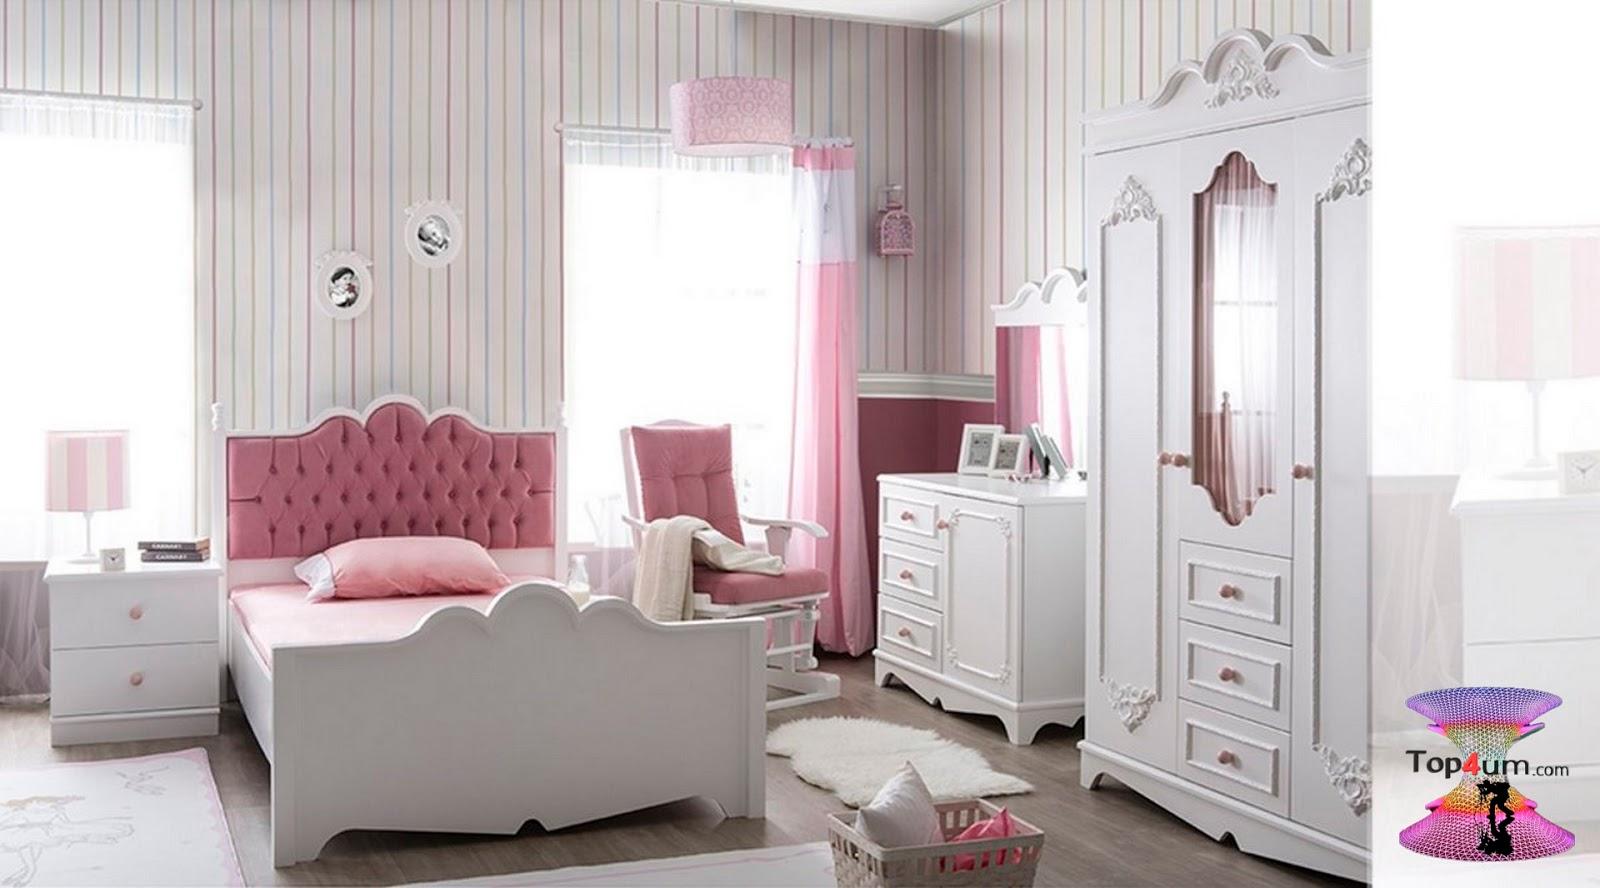 أحدث كتالوج صور ألوان غرف نوم أطفال و شباب 2020 Top4